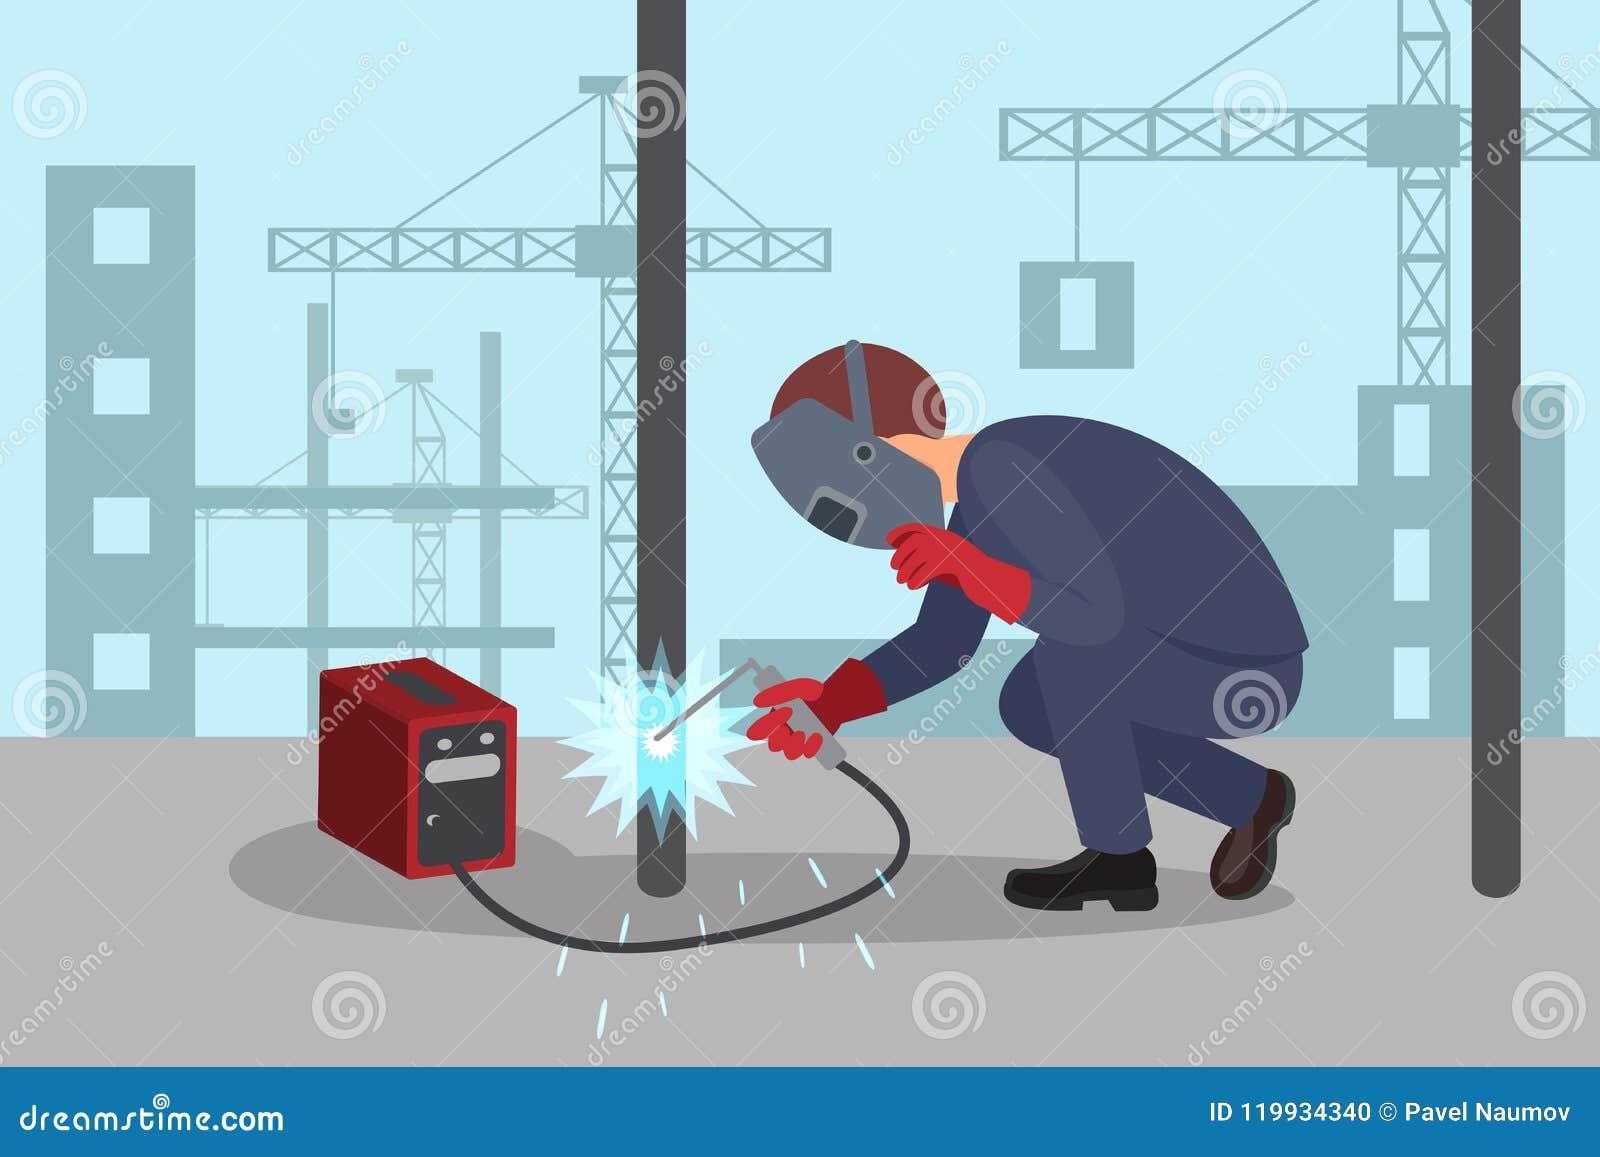 man welds steel construction by welding machine professional welder rh dreamstime com